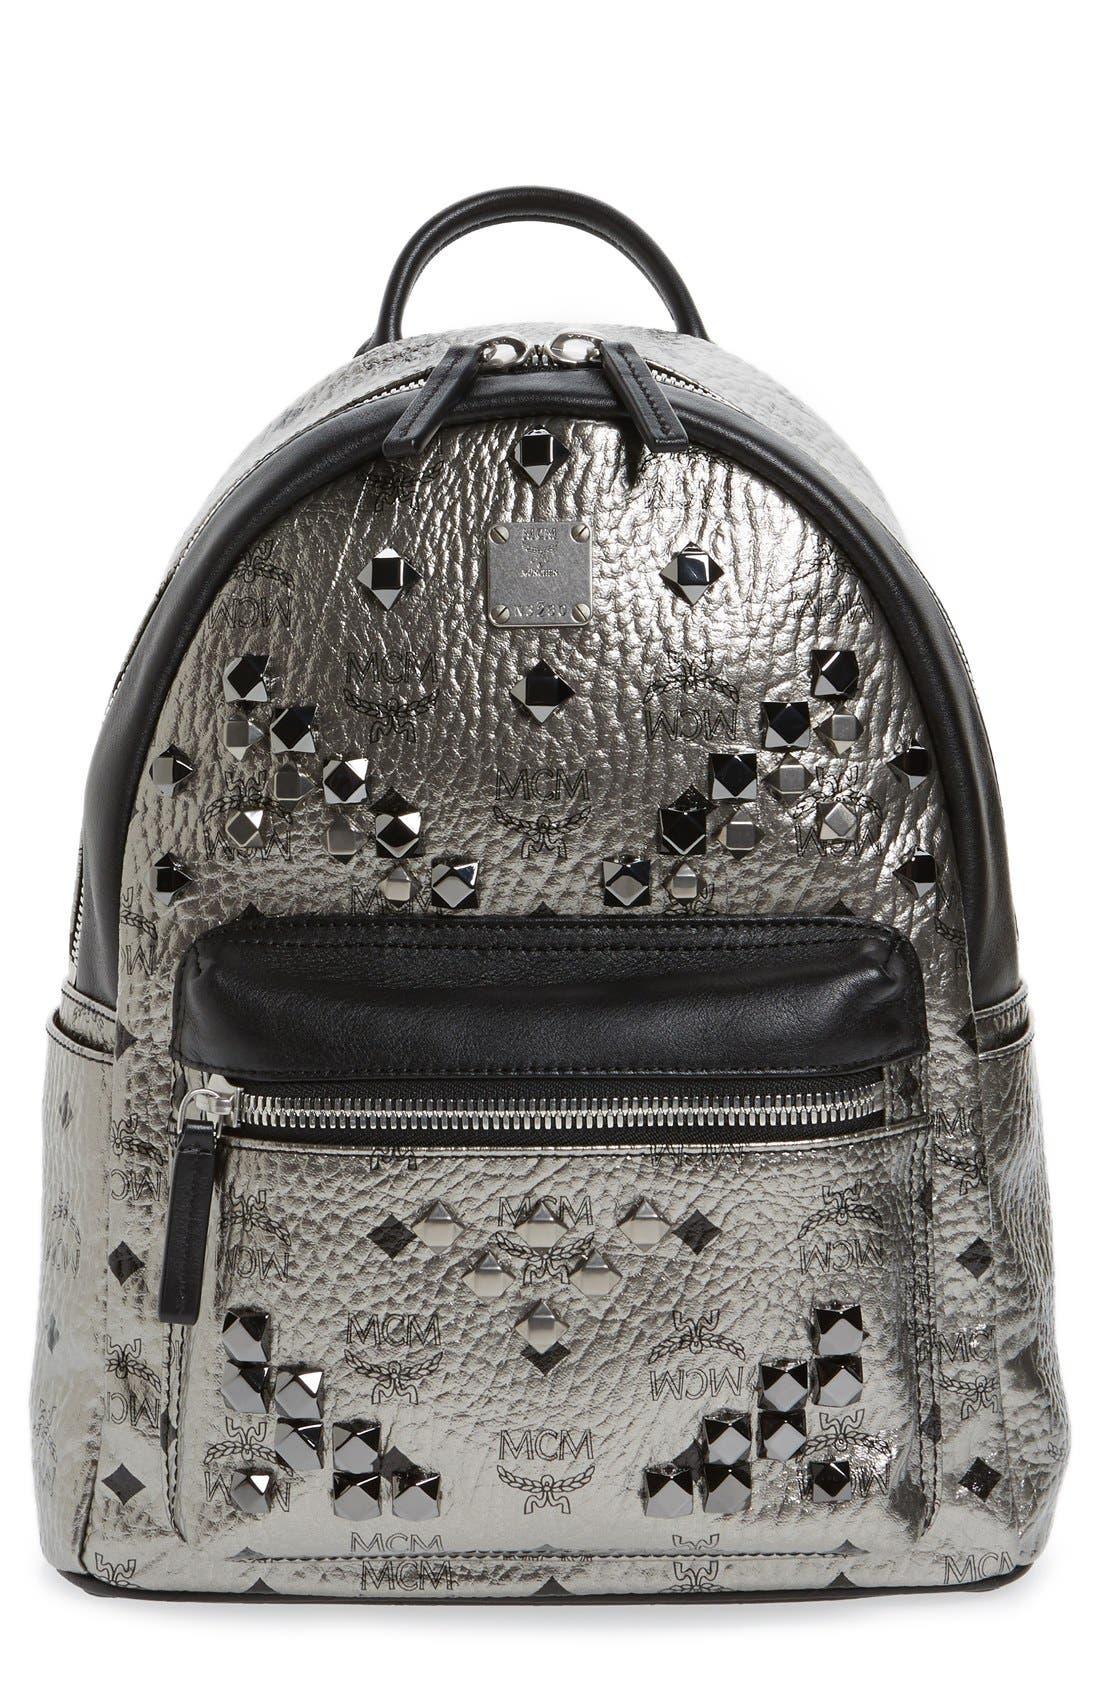 Alternate Image 1 Selected - MCM 'Small Stark' Studded Backpack